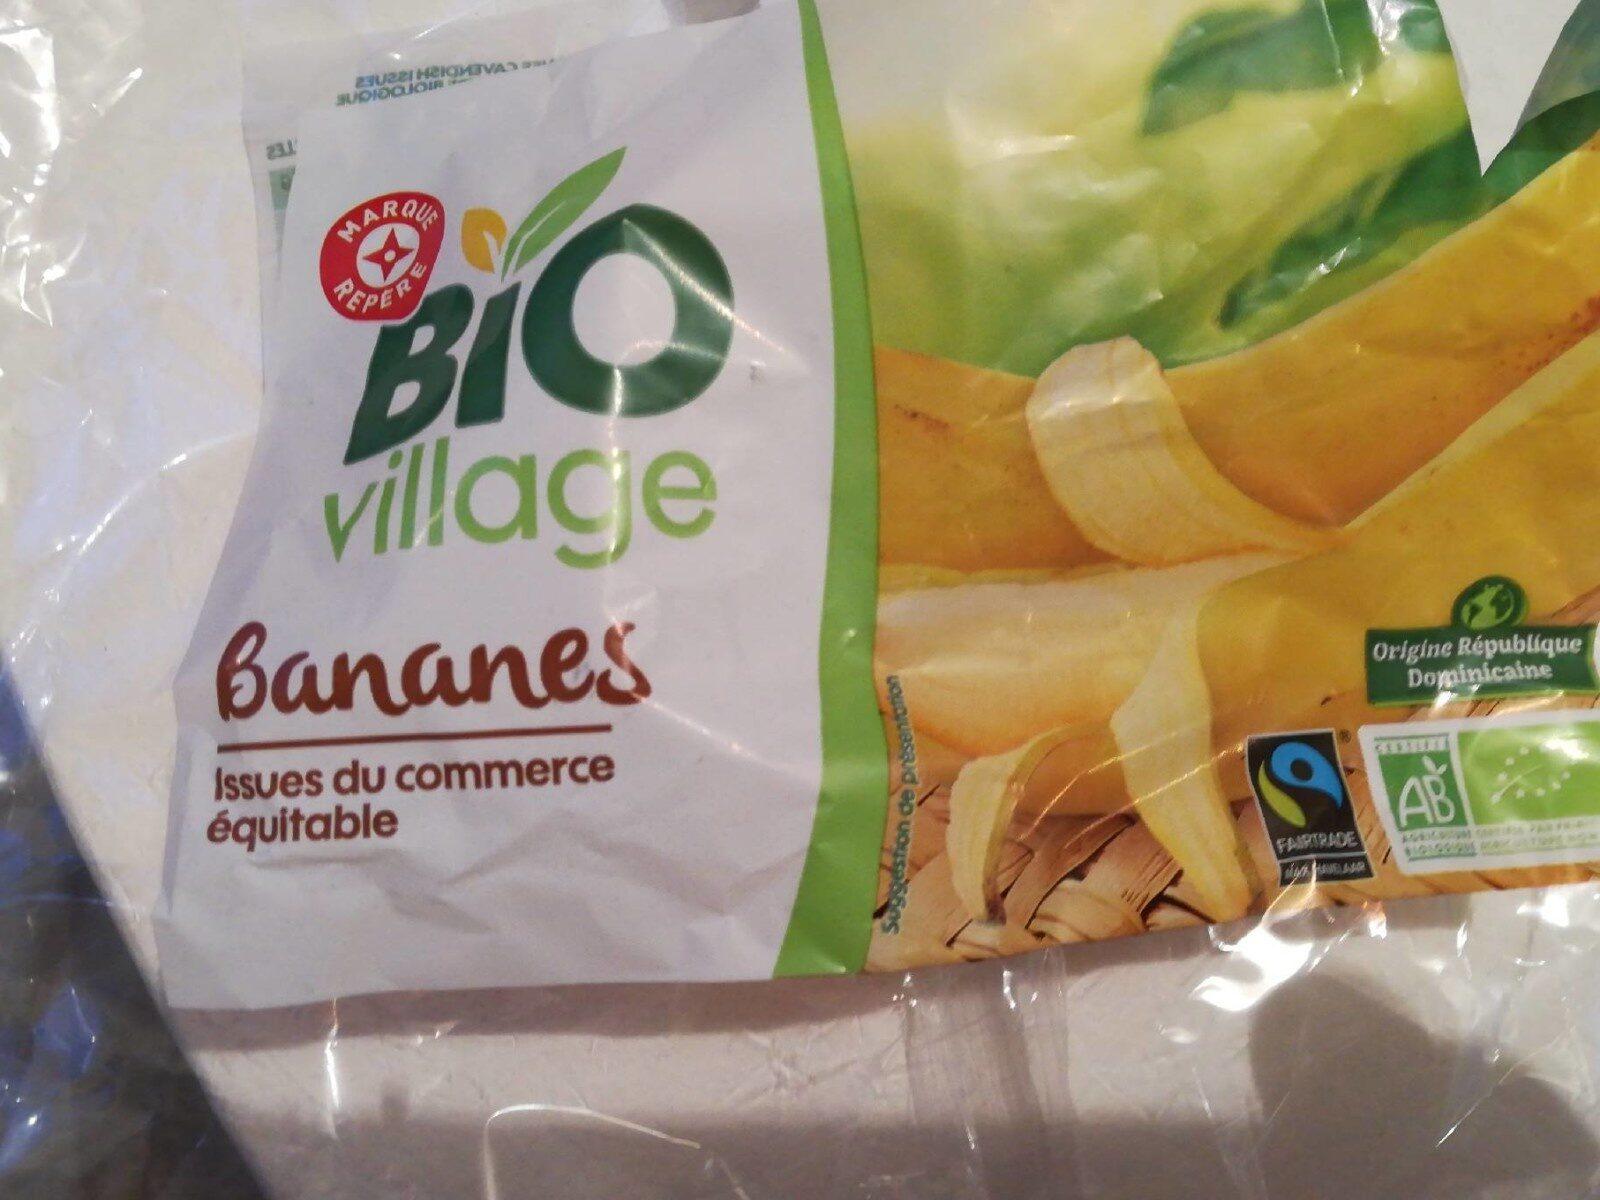 Banane cavendish - Product - fr